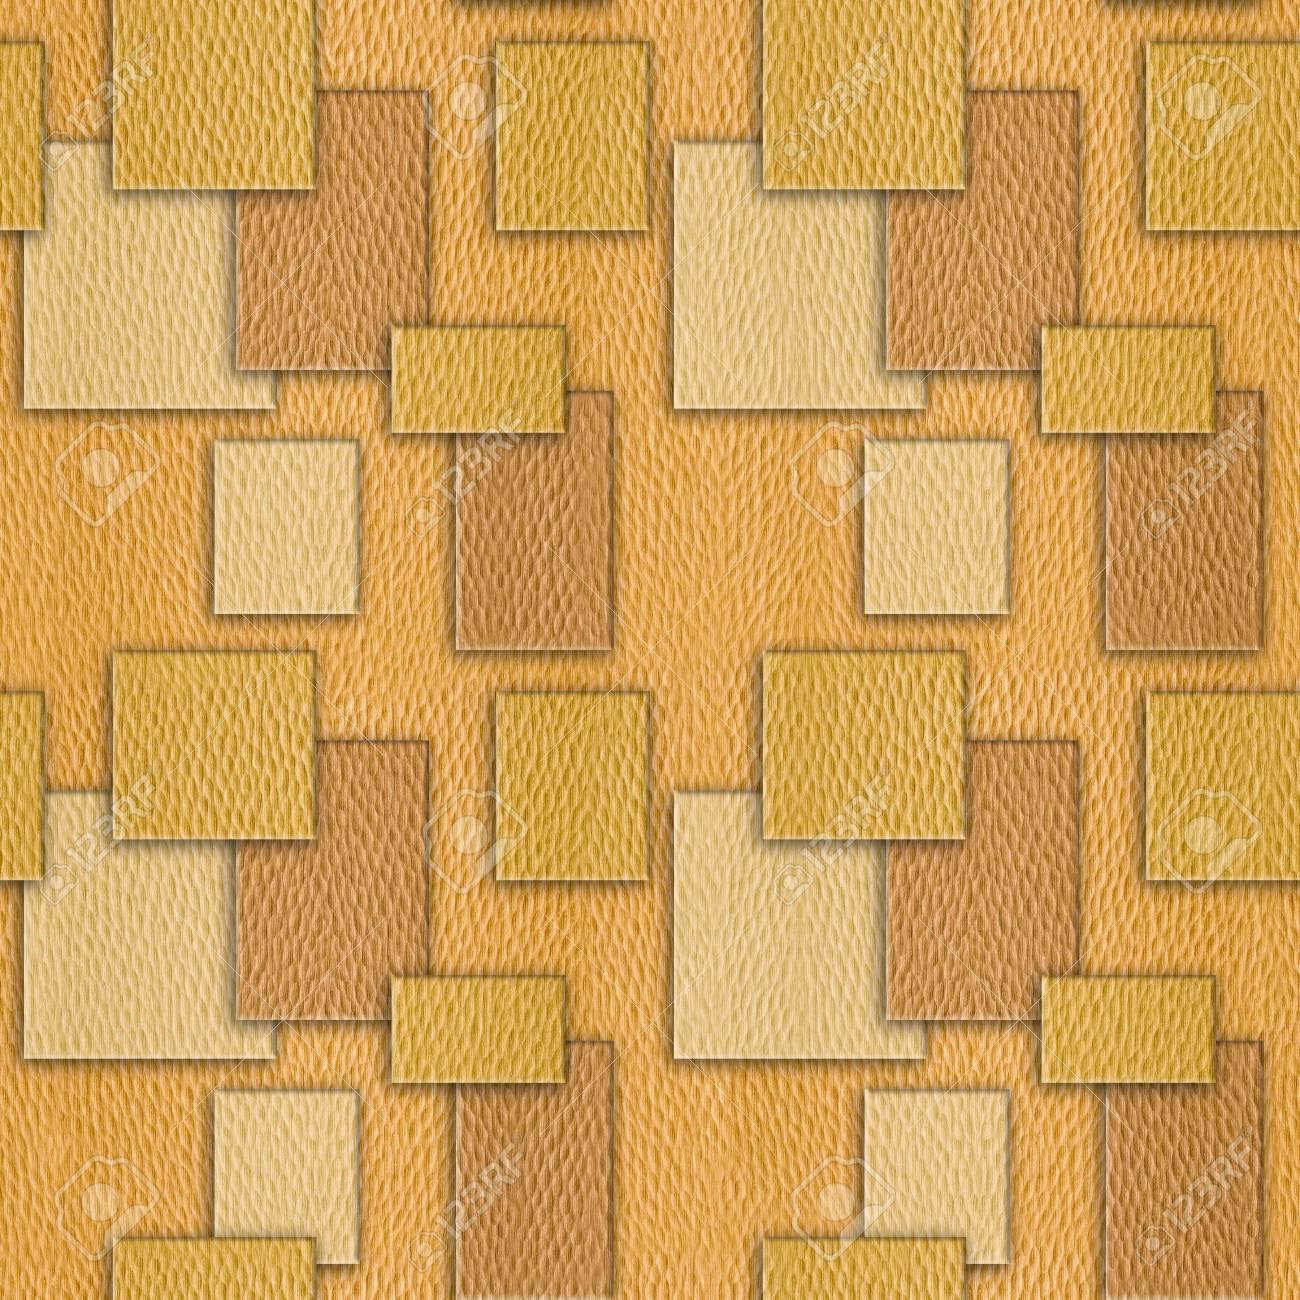 Interior Wall Panel Pattern - Decorative Tile Pattern - Seamless ...